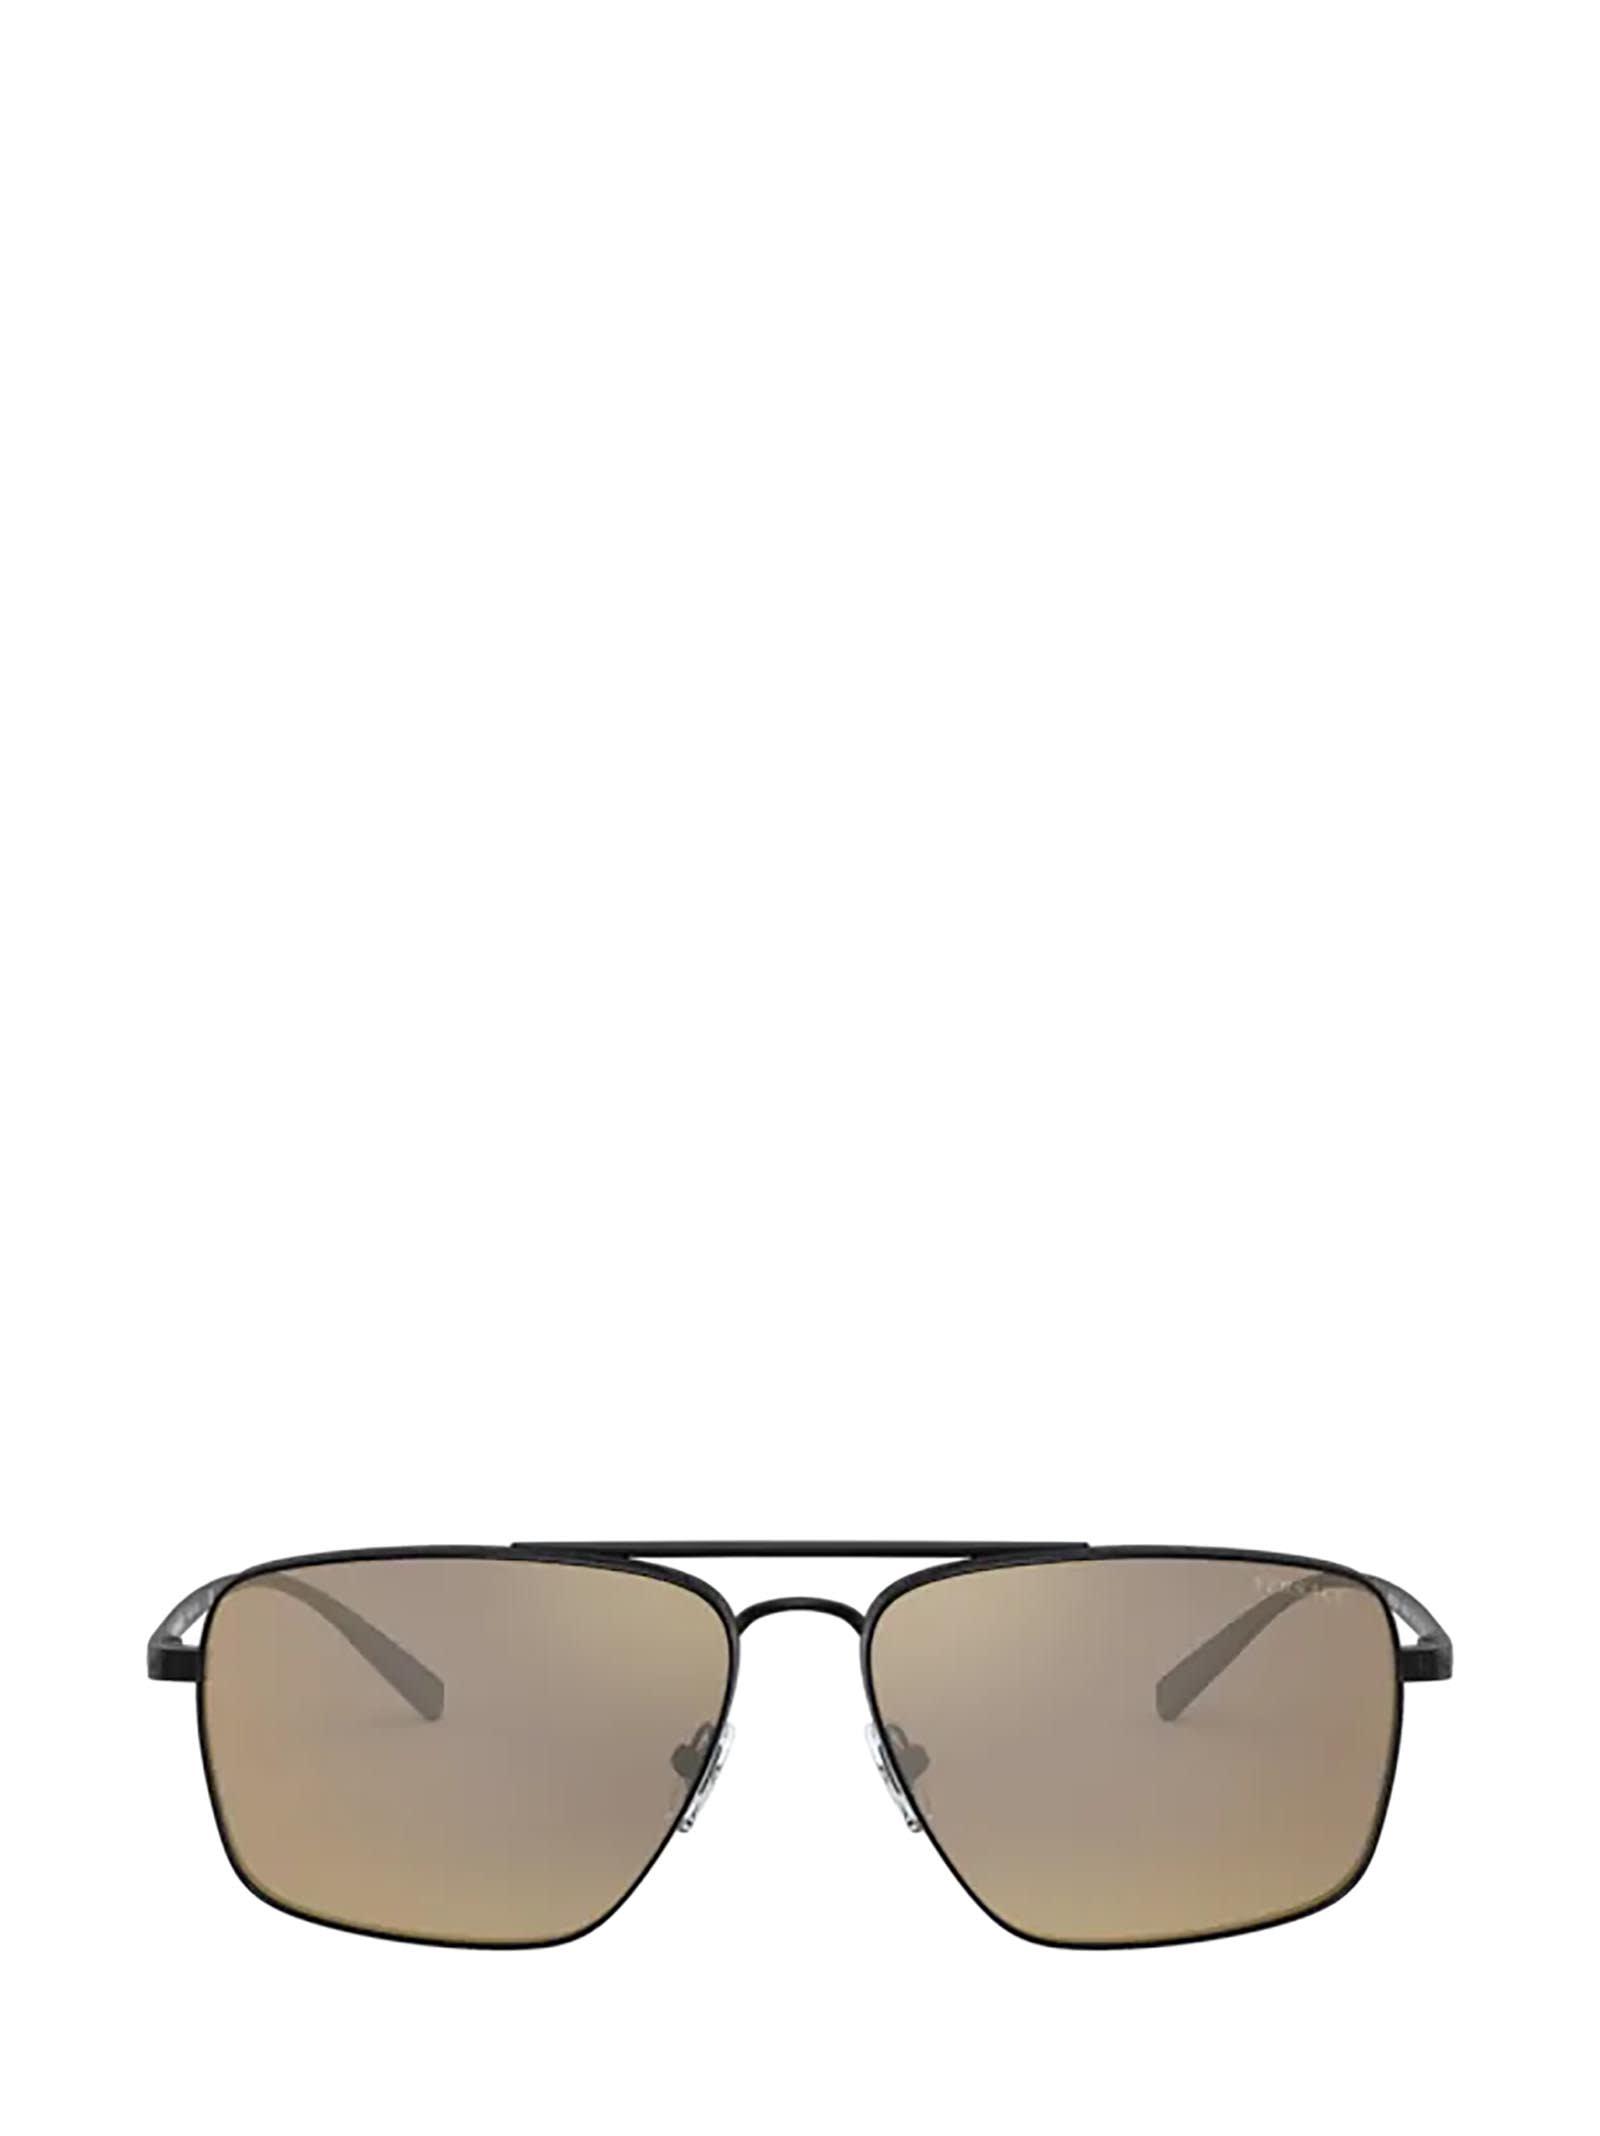 Versace Versace Ve2216 Matte Black Sunglasses